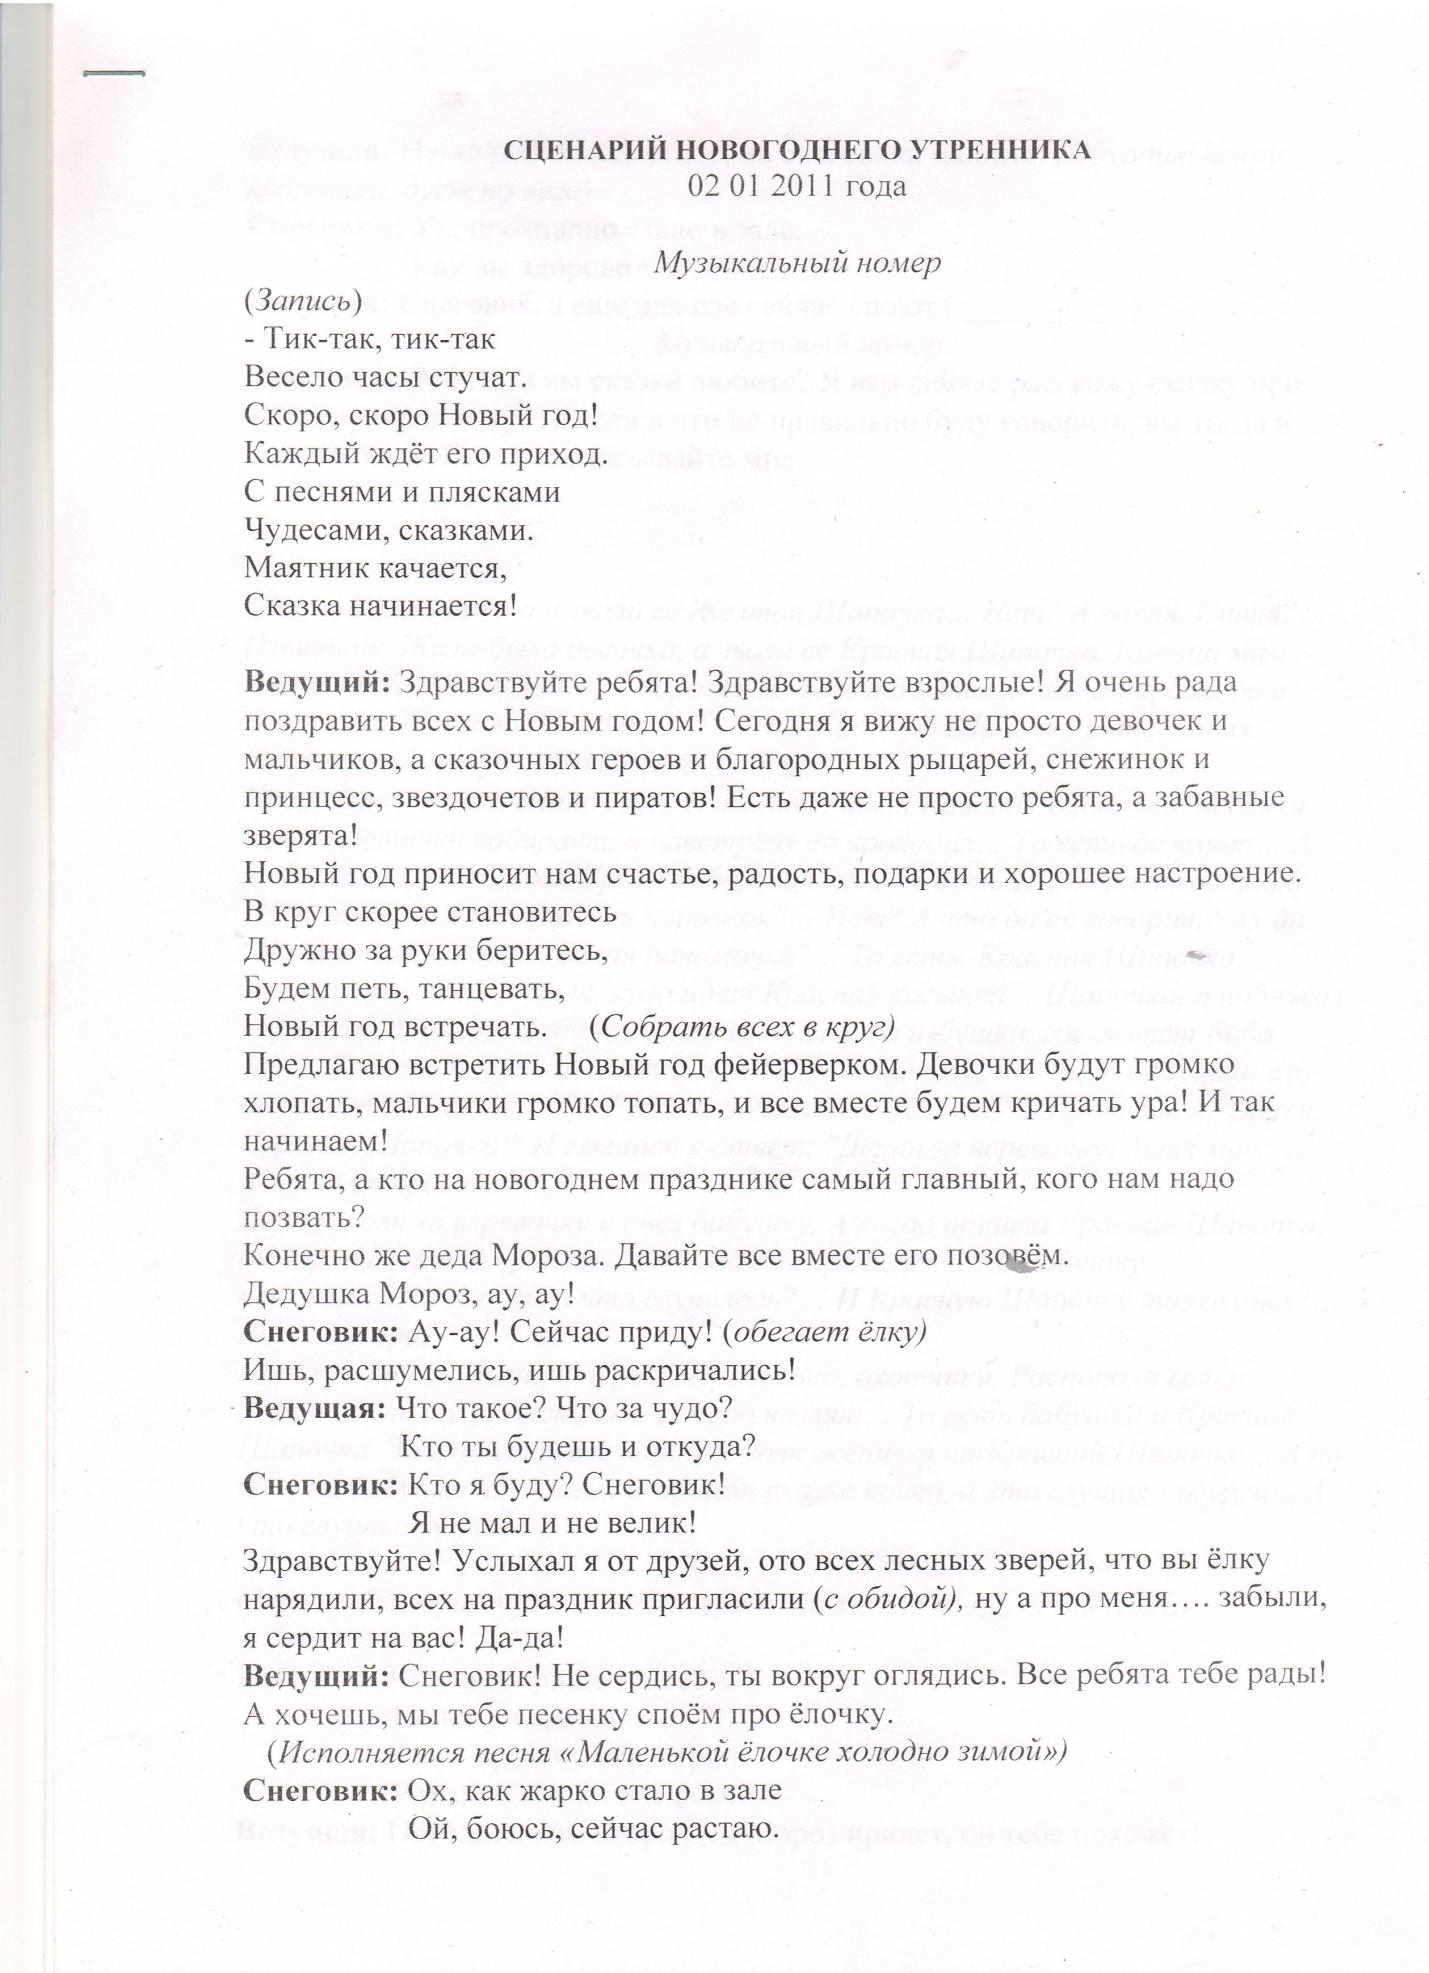 C:\Users\Sof\AppData\Roaming\Skype\My Skype Received Files\scan 1(1).jpg